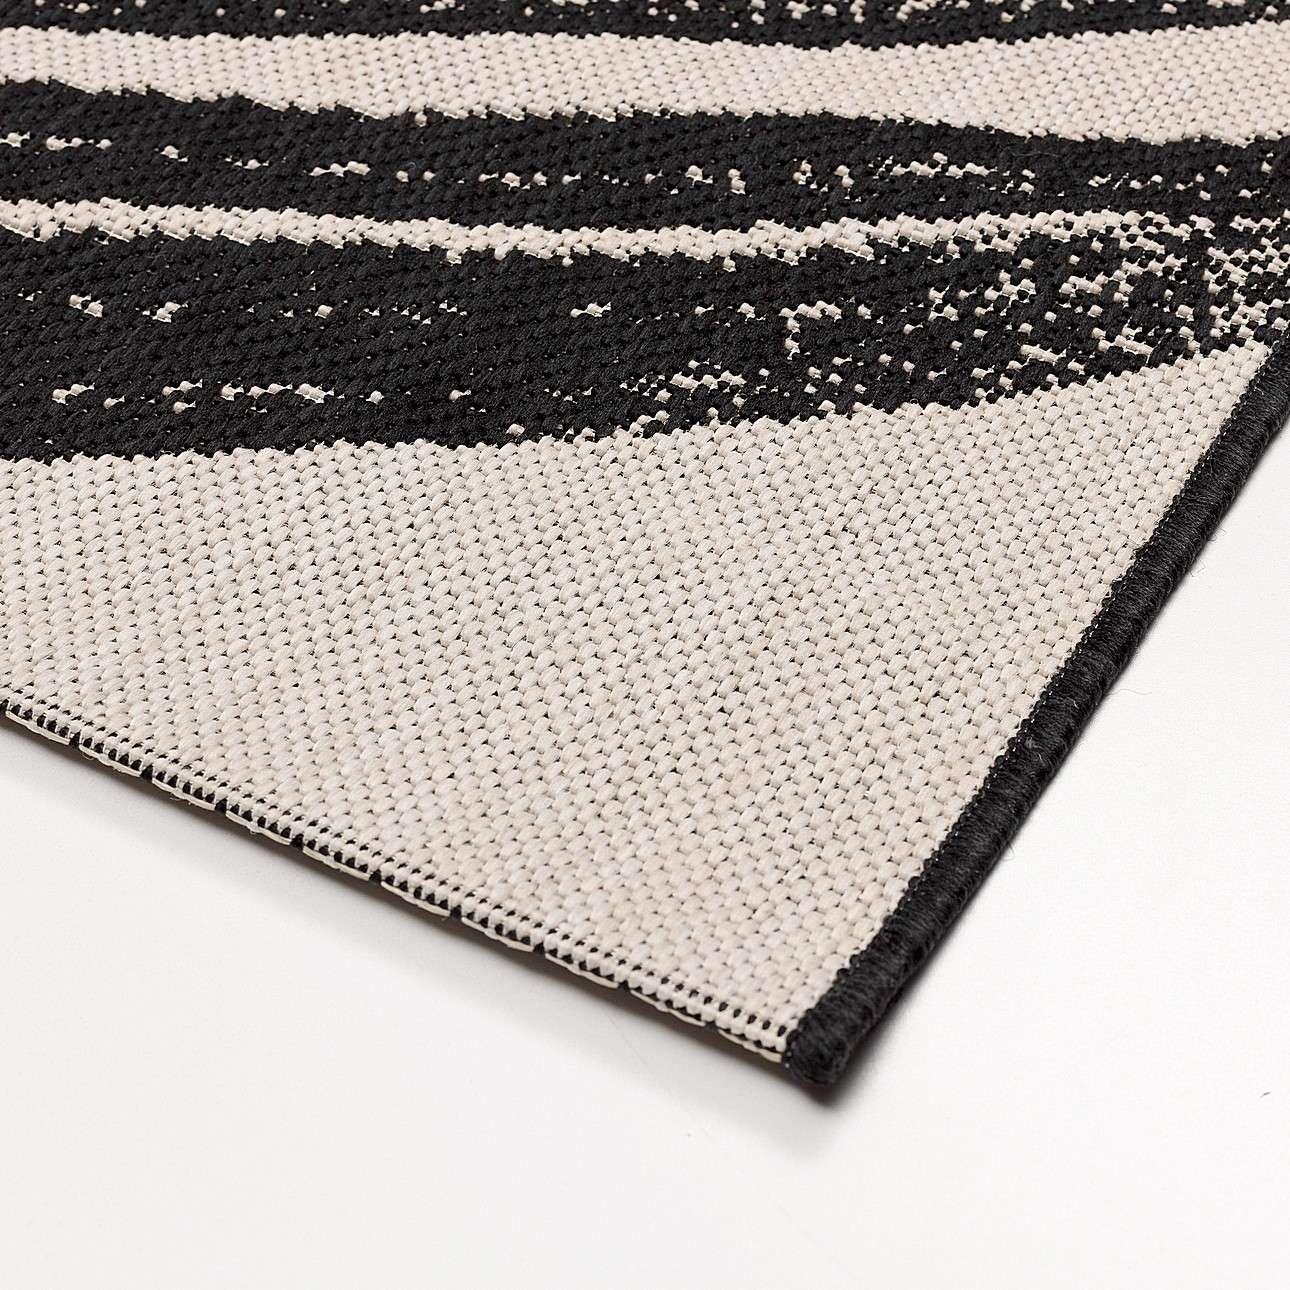 Teppich Lineo wool/black 120x170cm